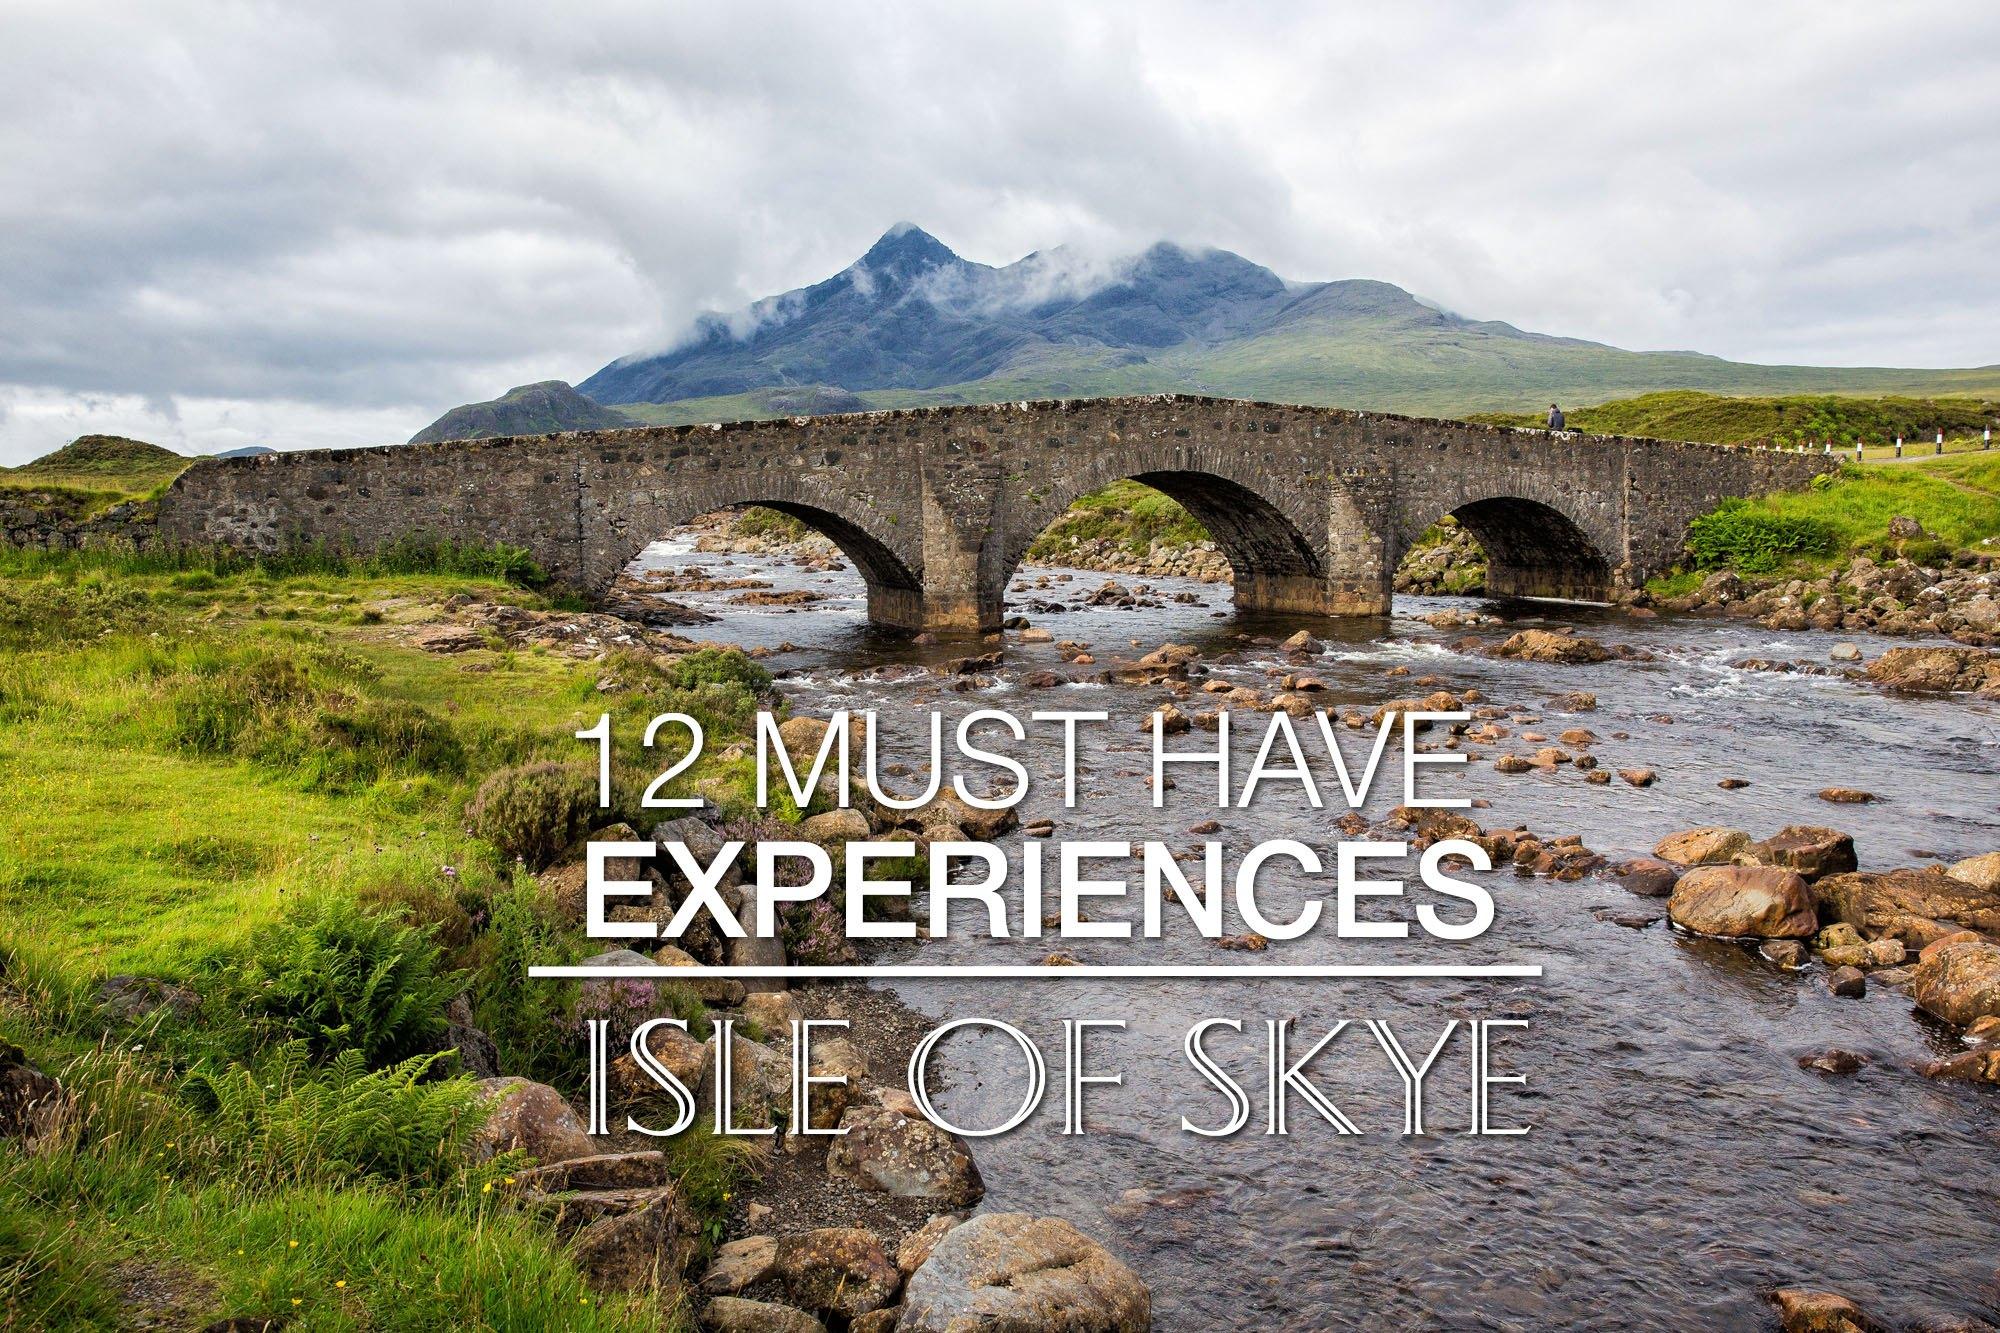 Isle of Skye best things to do